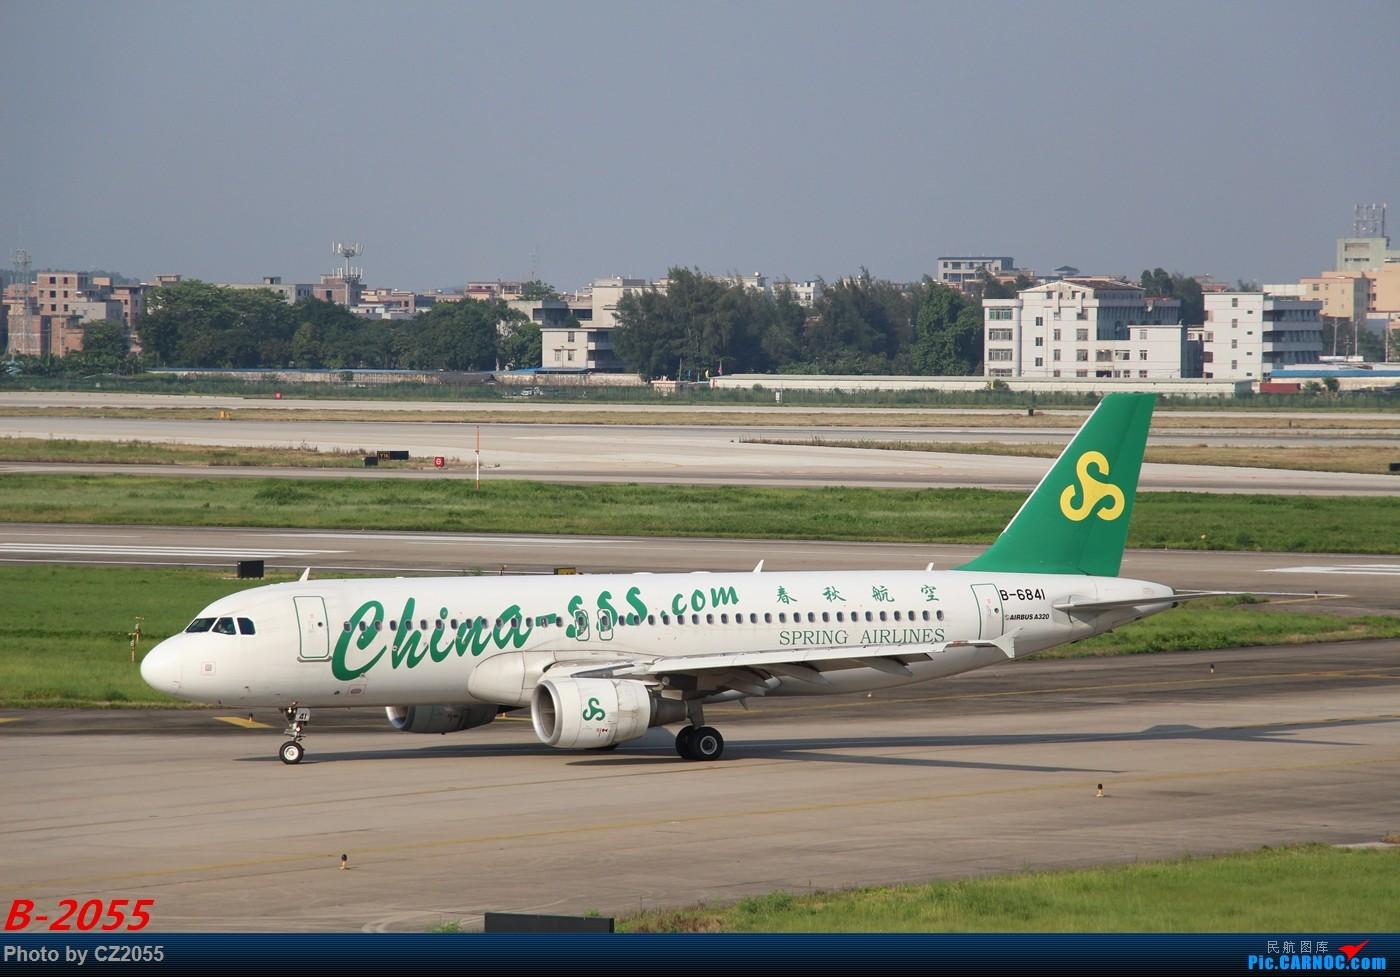 Re:[原创]Re:[原创]【广东青少年拍机小队】【C-Z-2055】发完737和宽体就升级320,那就再发一组320系列。 AIRBUS A320-200 B-6841 中国广州白云国际机场